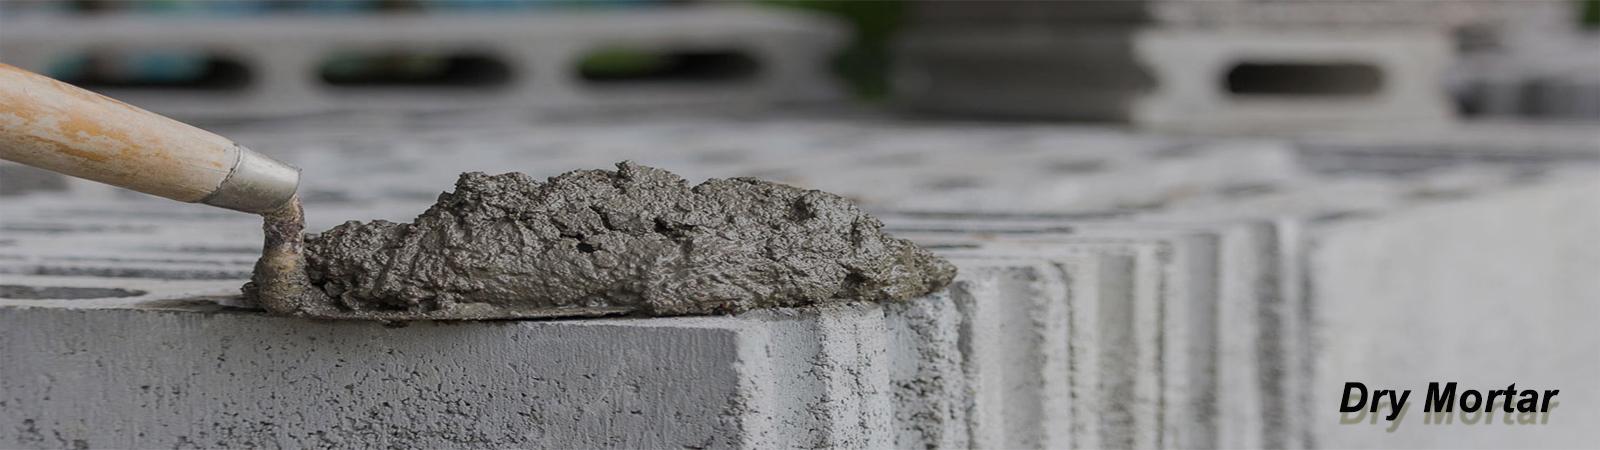 Dry Mortars, www.hibond.in